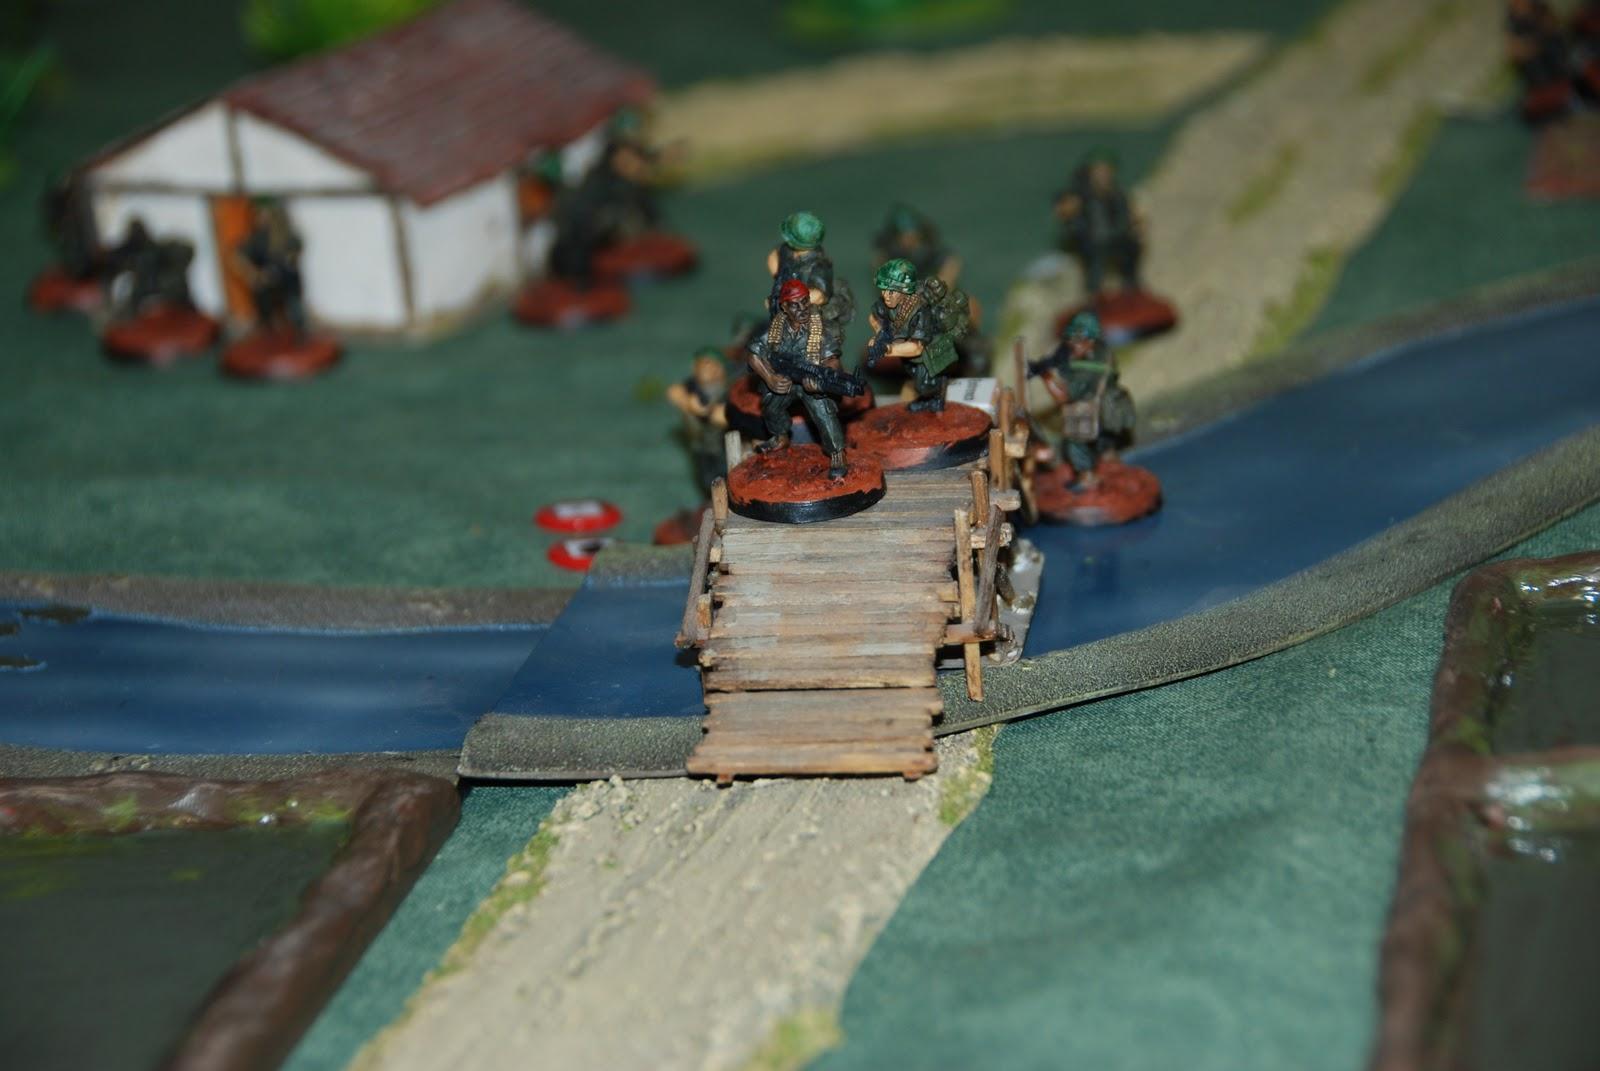 Baker team cautiously crossing a bridge